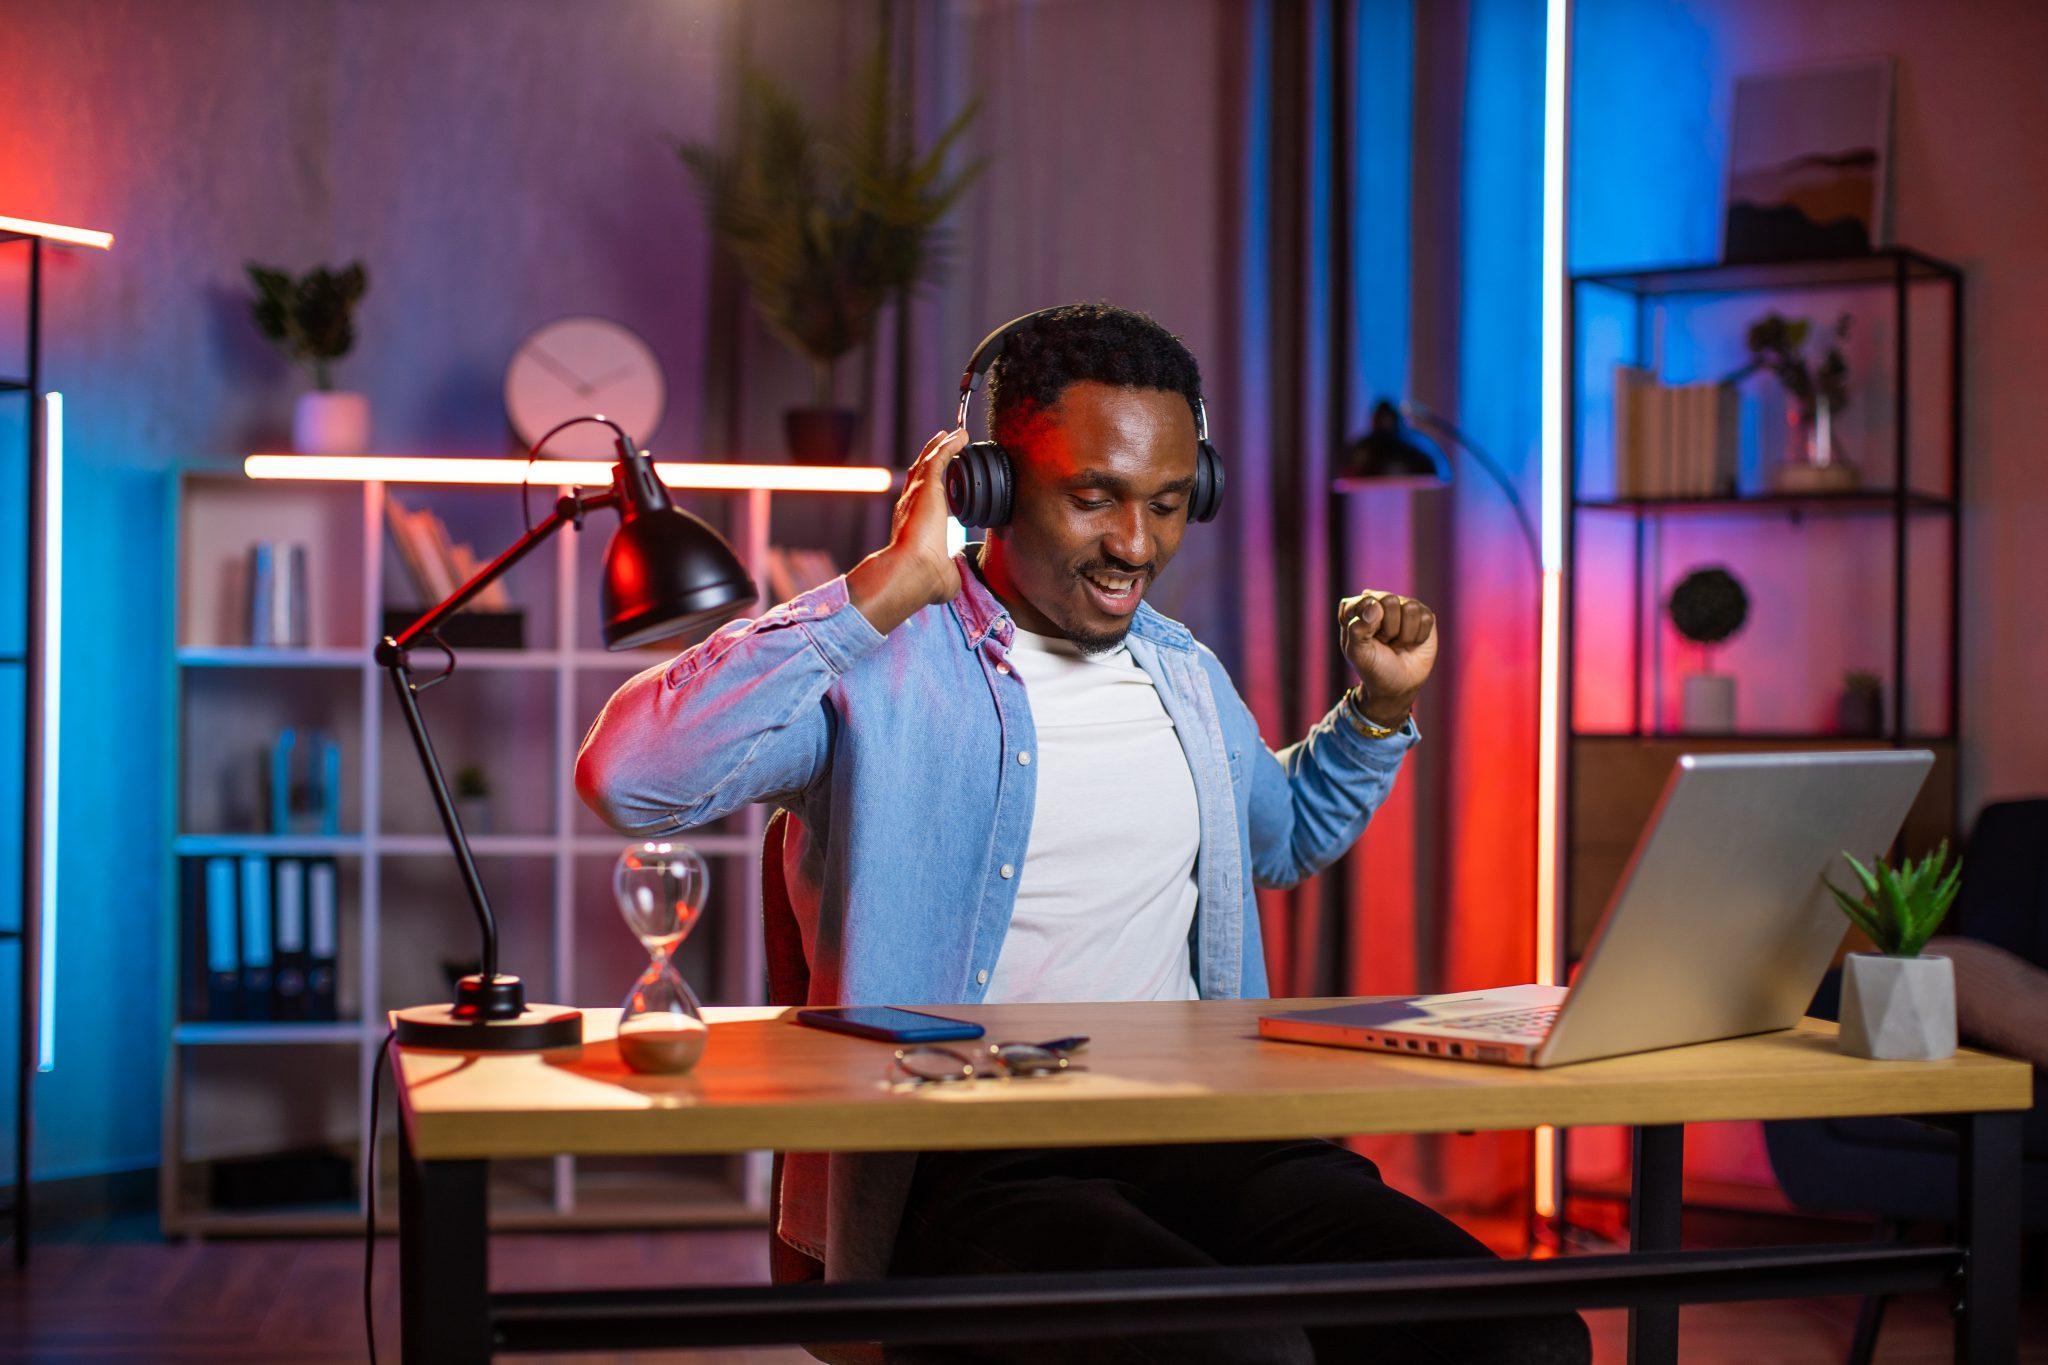 Positive african man listening music in wireless headphones